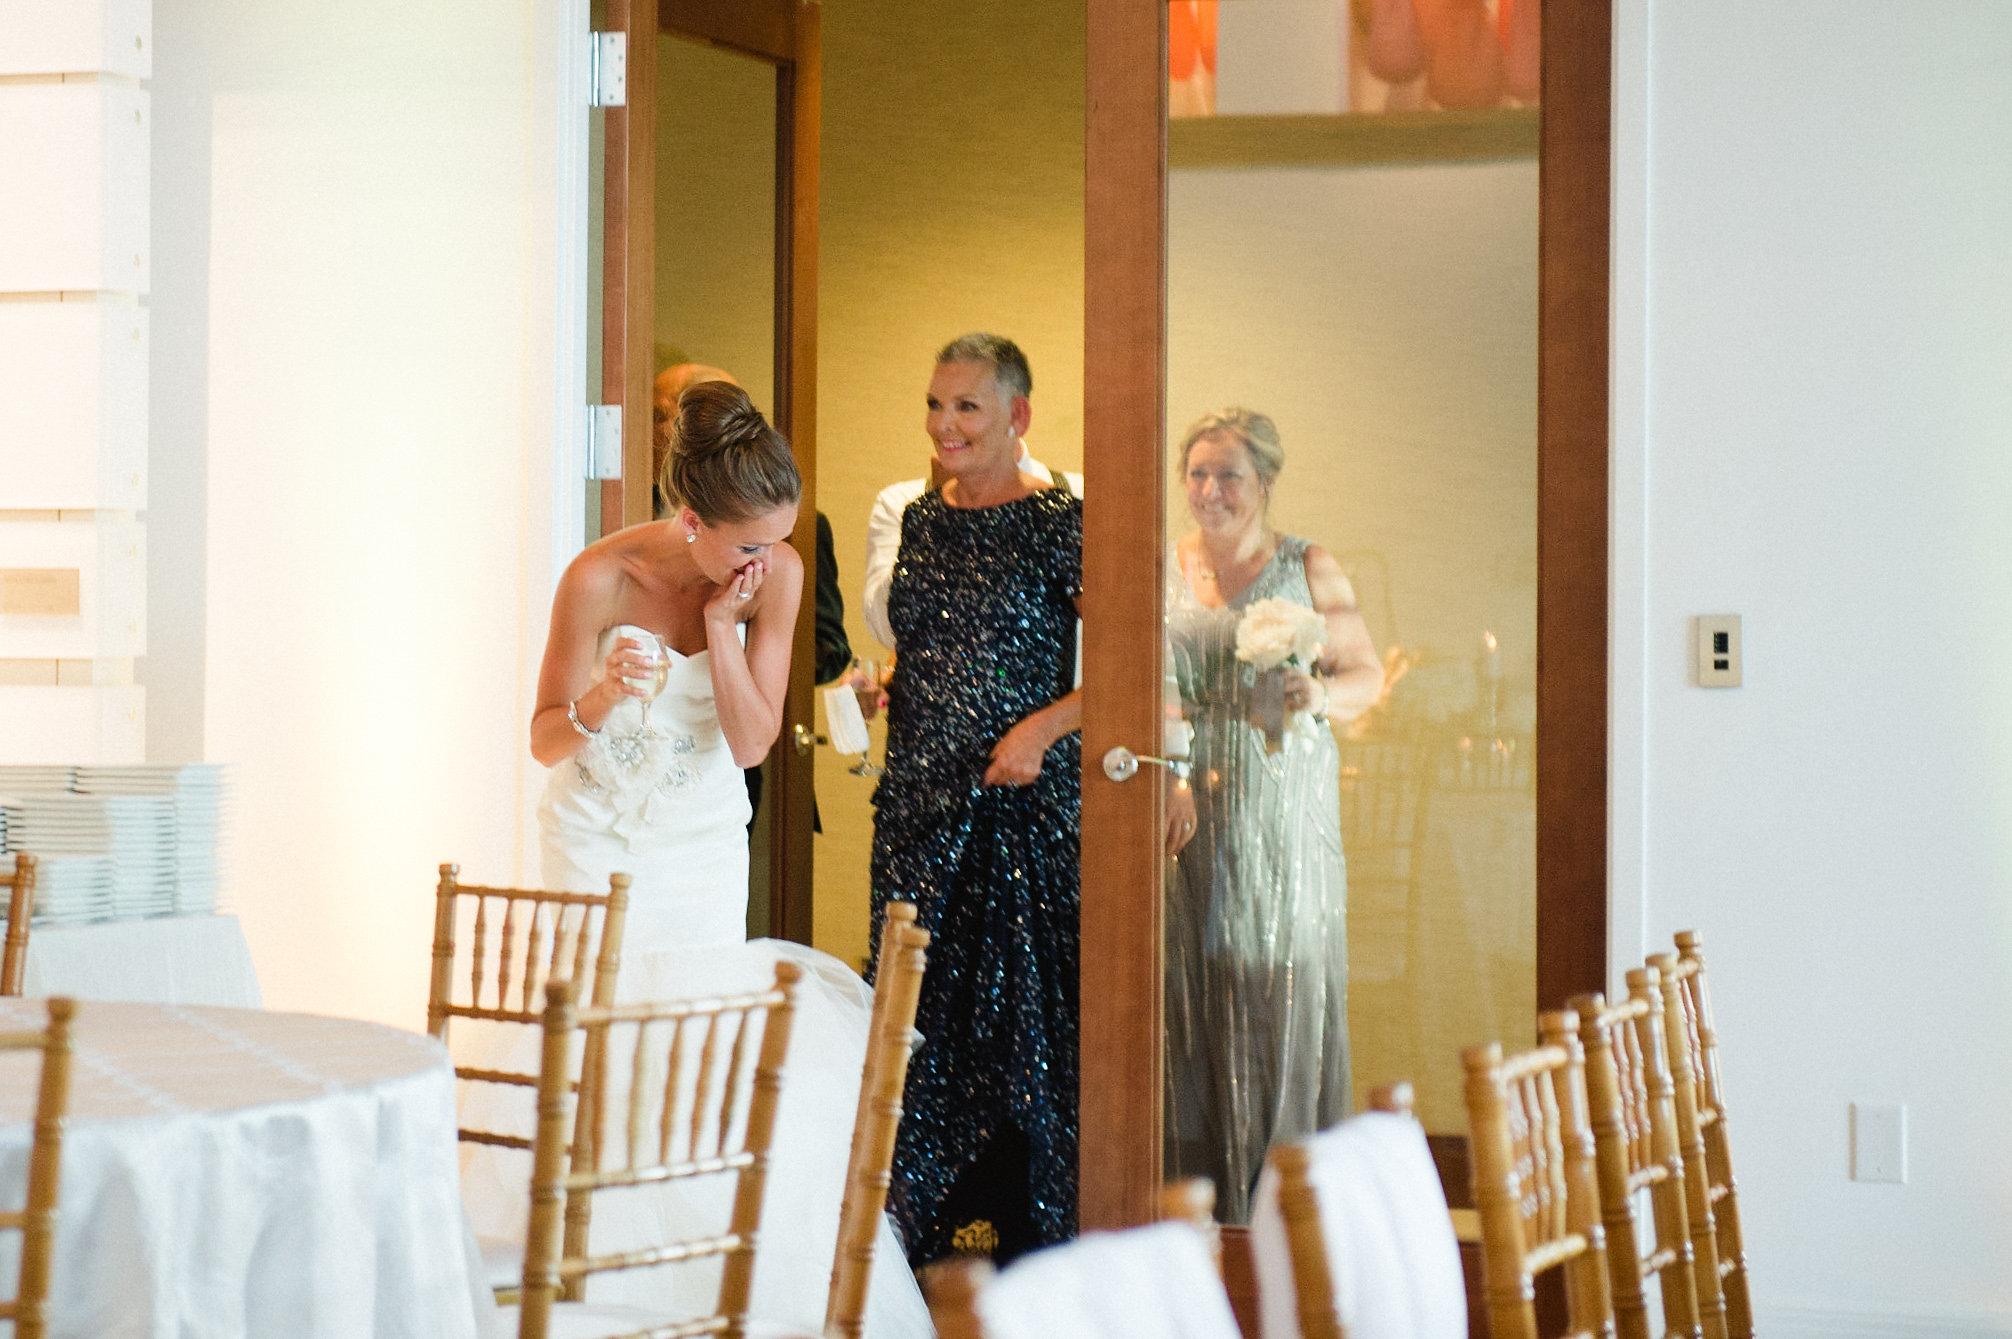 shelby&jordan|smitten&hooked|wedding|roomreveal-011.jpg